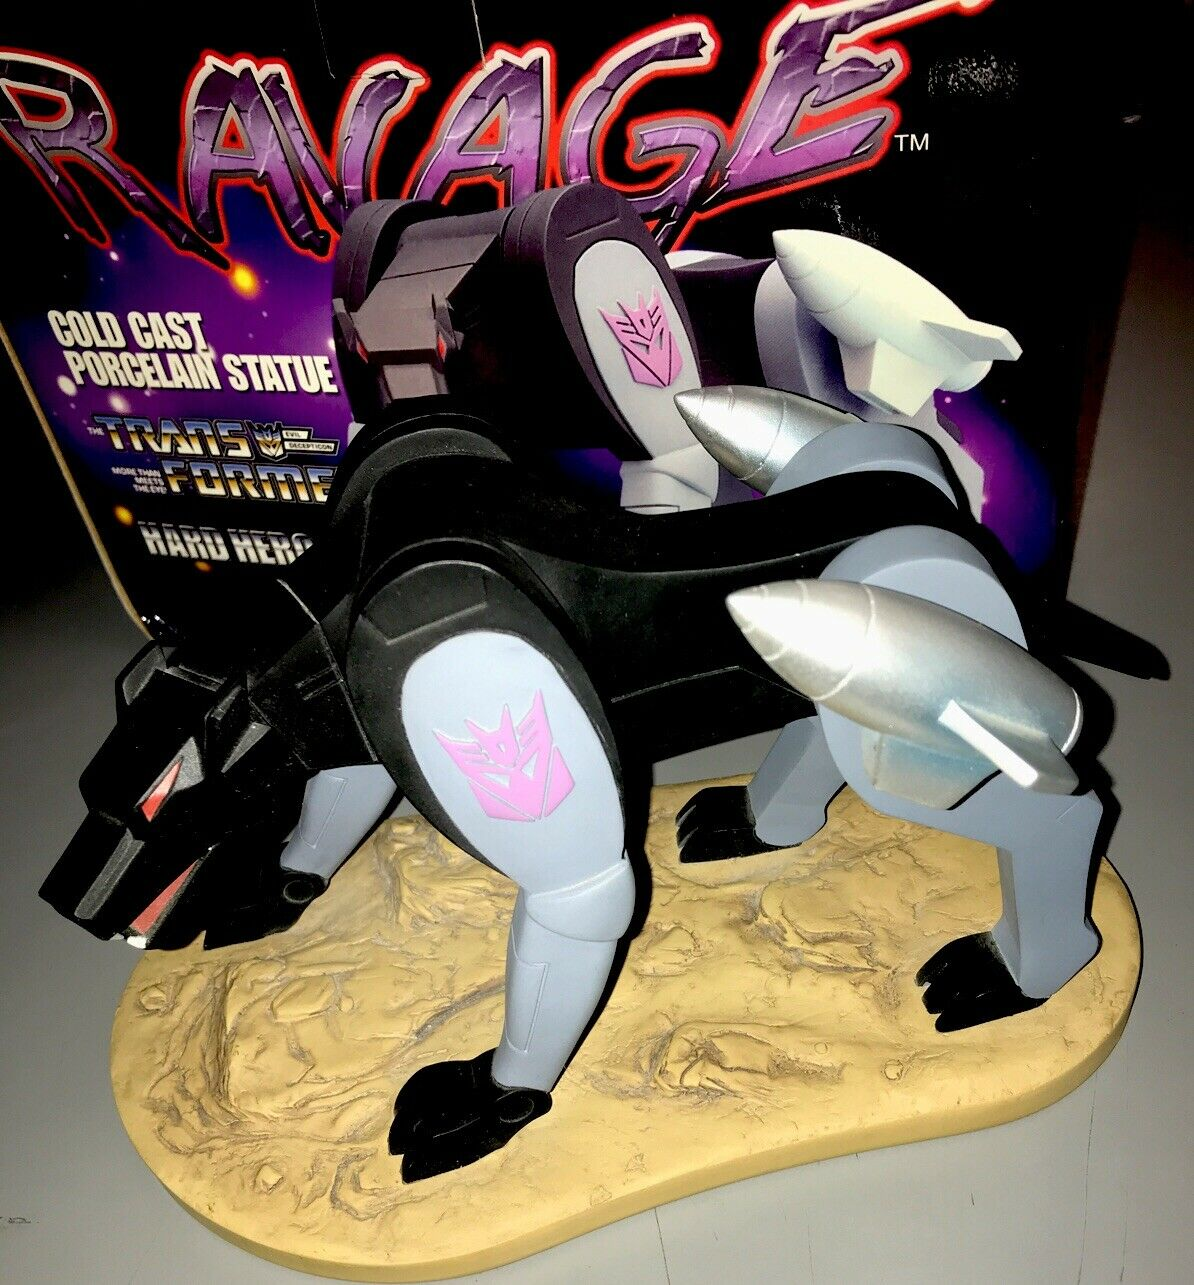 Ravage Transformers Porcelain Bust by Hard Hero Hasbro Statue Decepticon